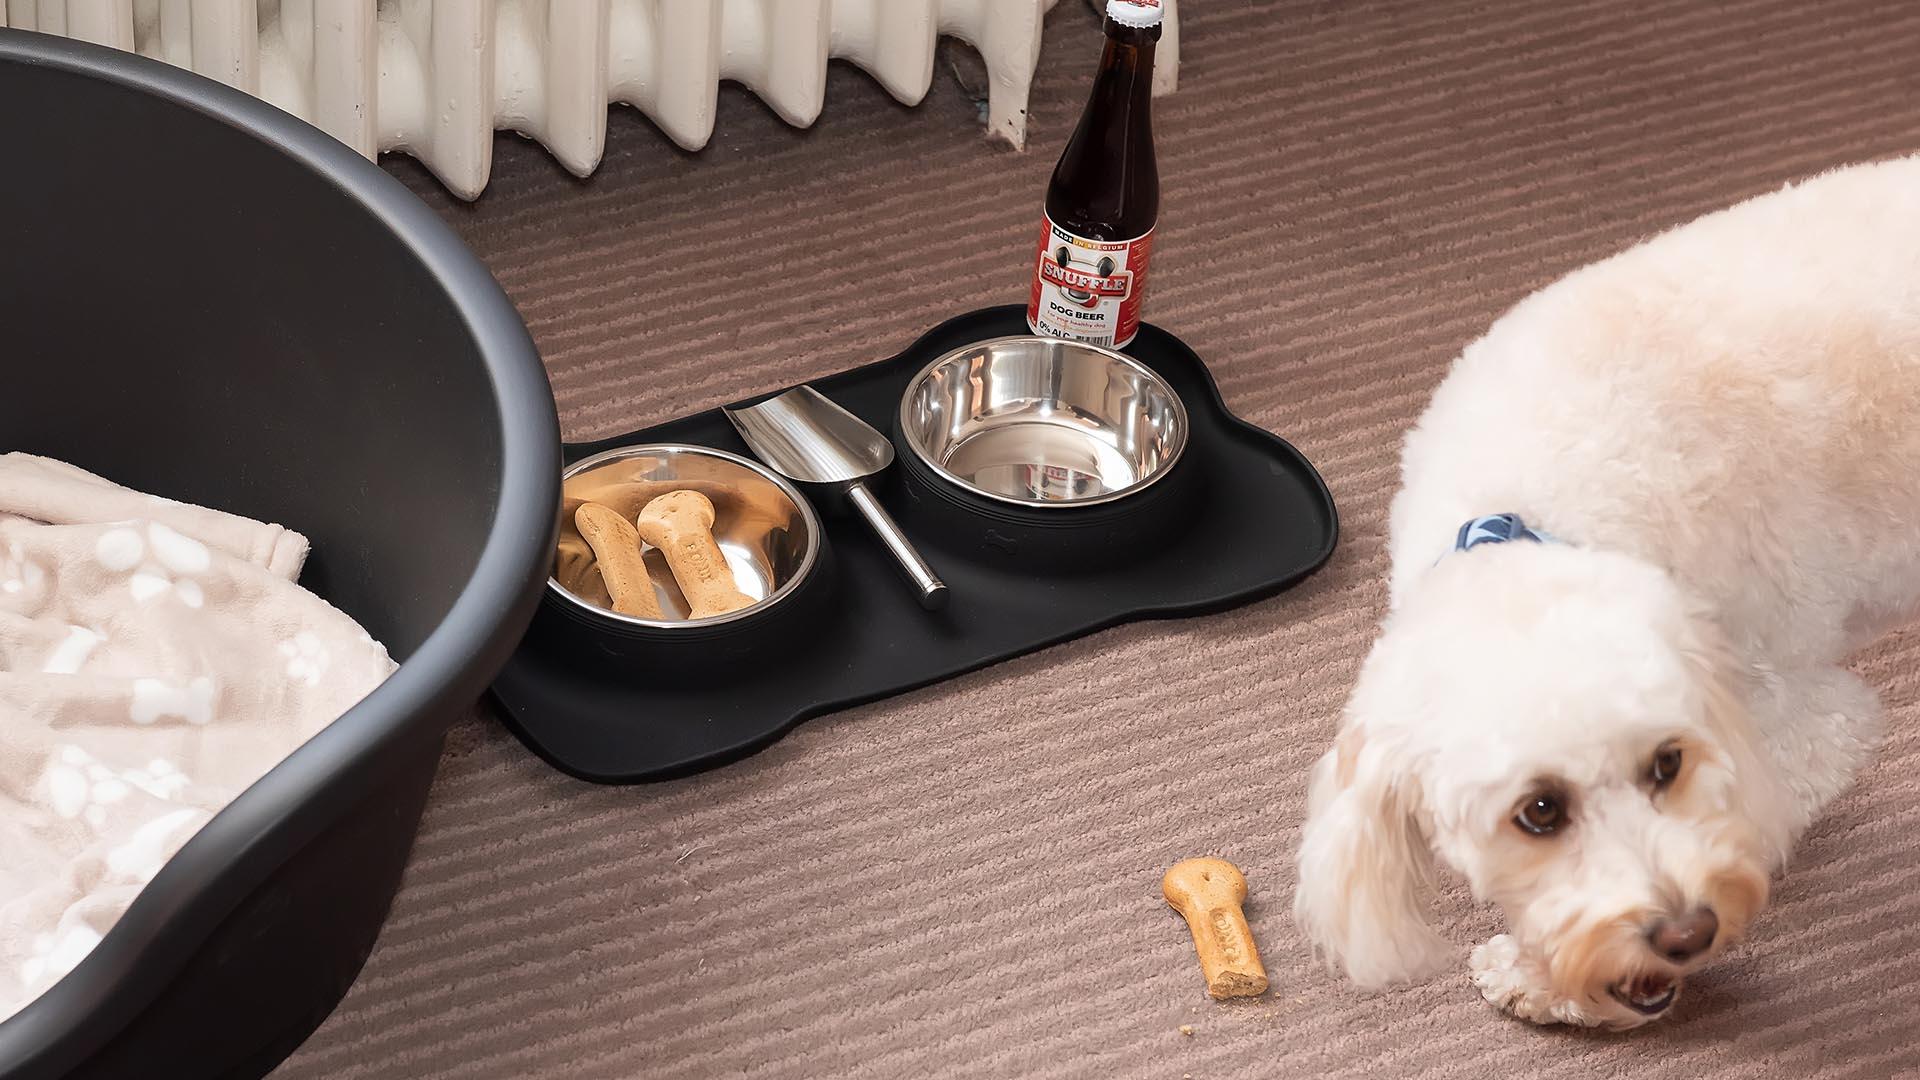 Dog friendly hotels in Southampton - MERCURE SOUTHAMPTON CENTRE DOLPHIN HOTEL 2